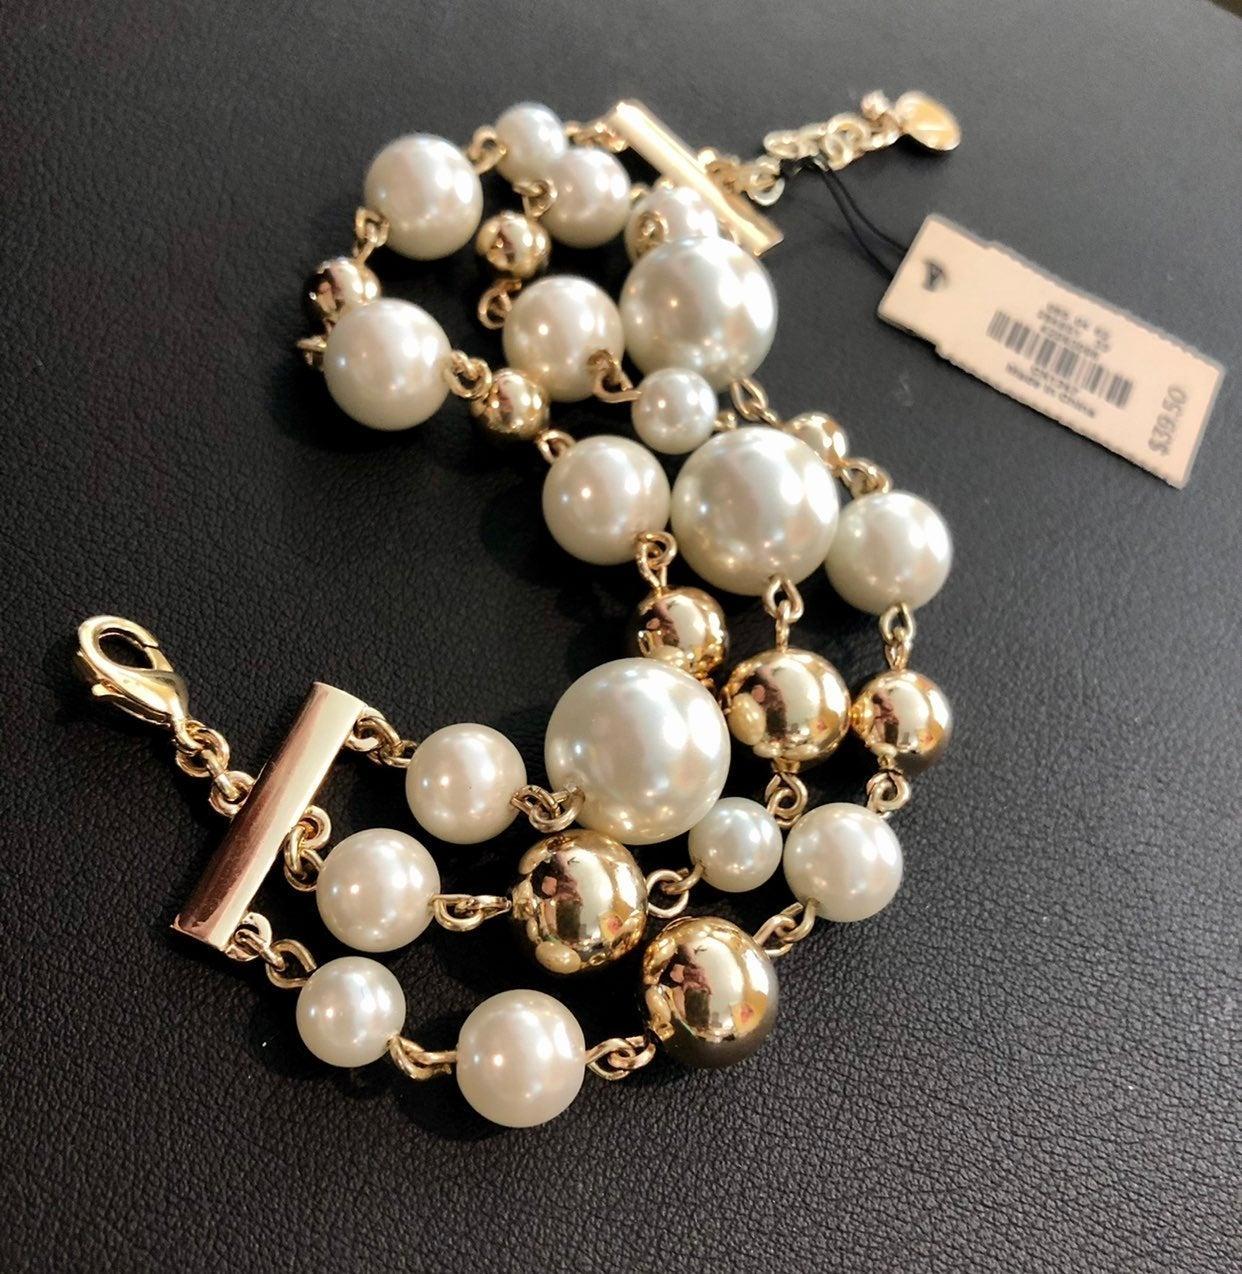 NWT Talbots Chunky Pearl & Gold Bracelet